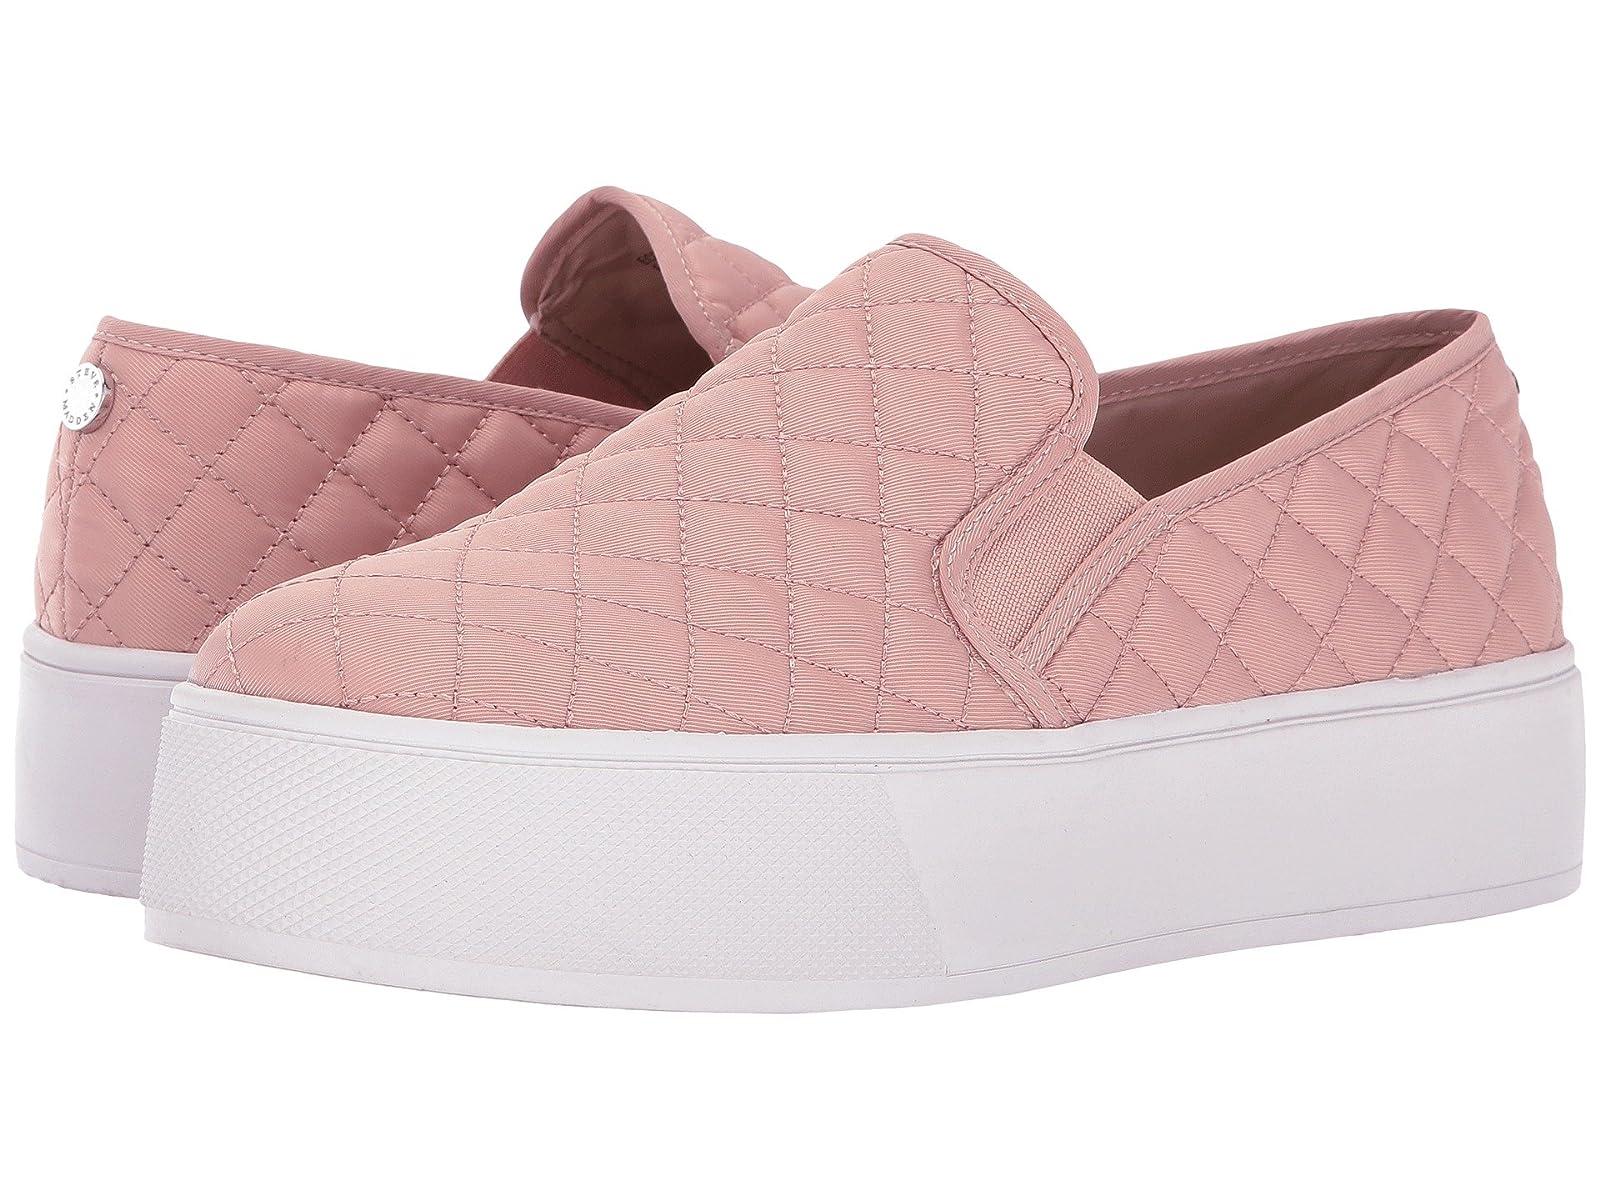 Steve Steve Steve Madden Ecentrcqp Platform Sneaker 342887